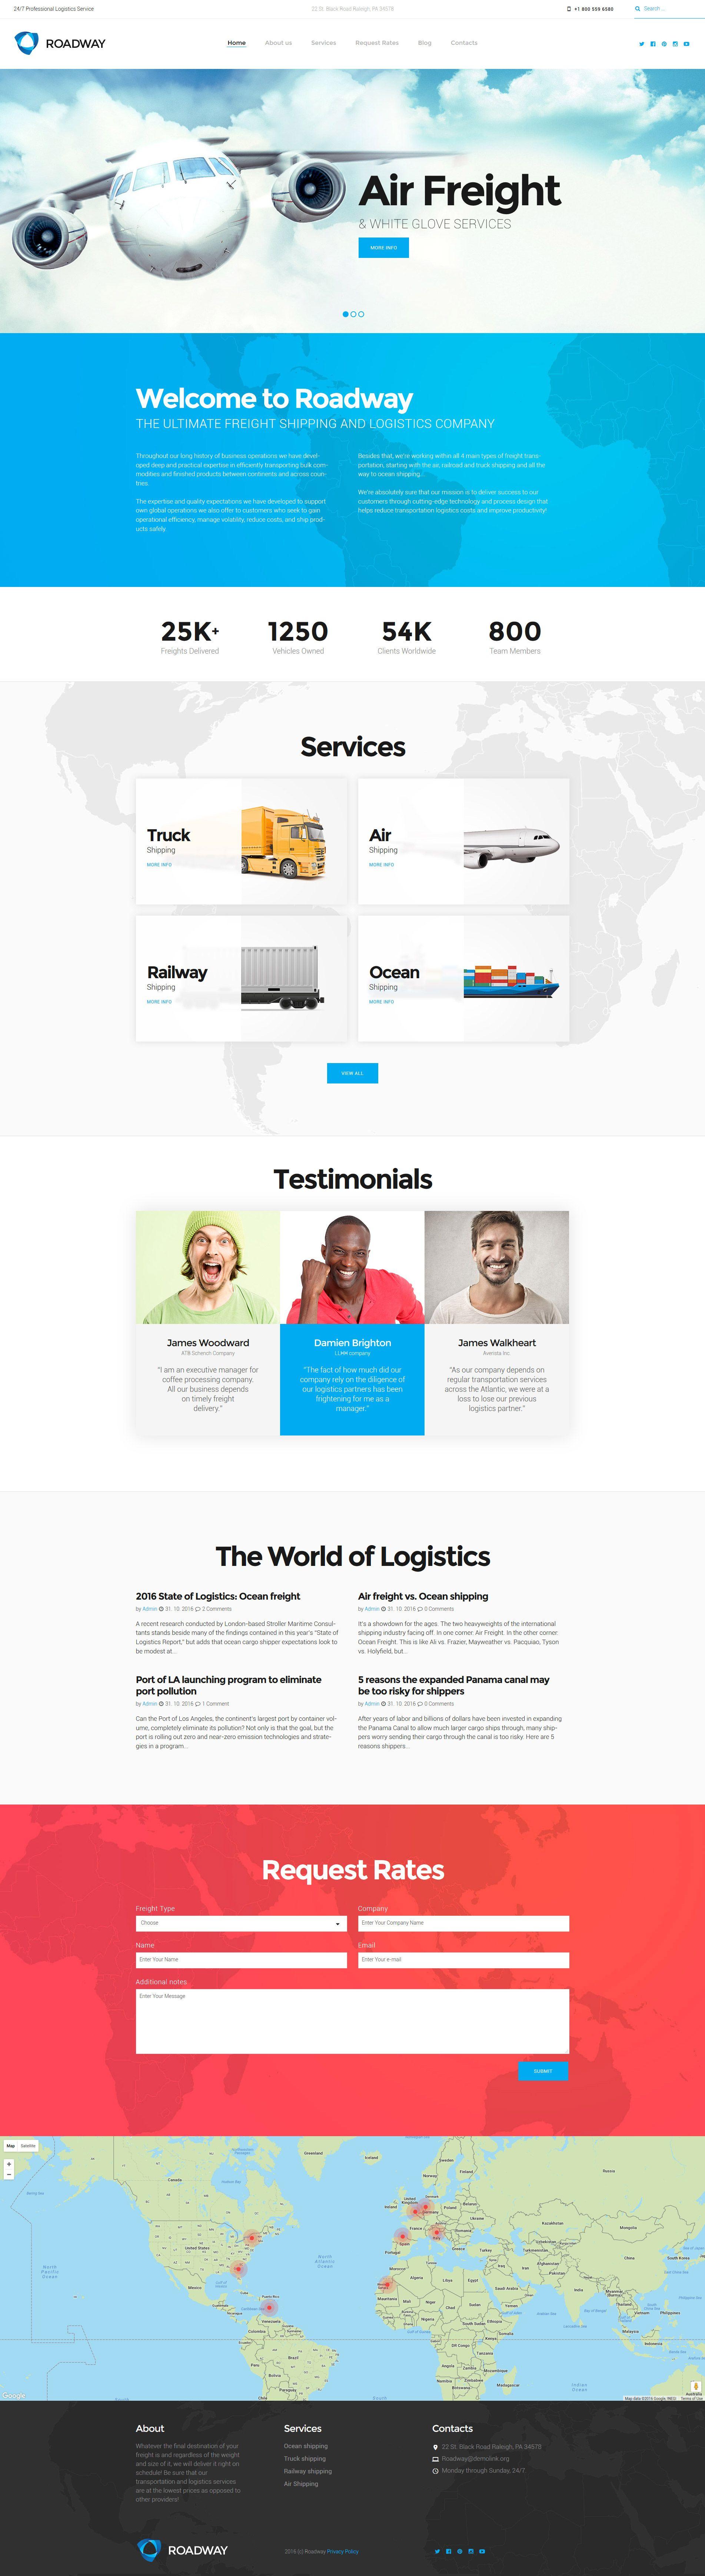 Roadway - Logistics & Transportation Services WordPress Theme | New ...